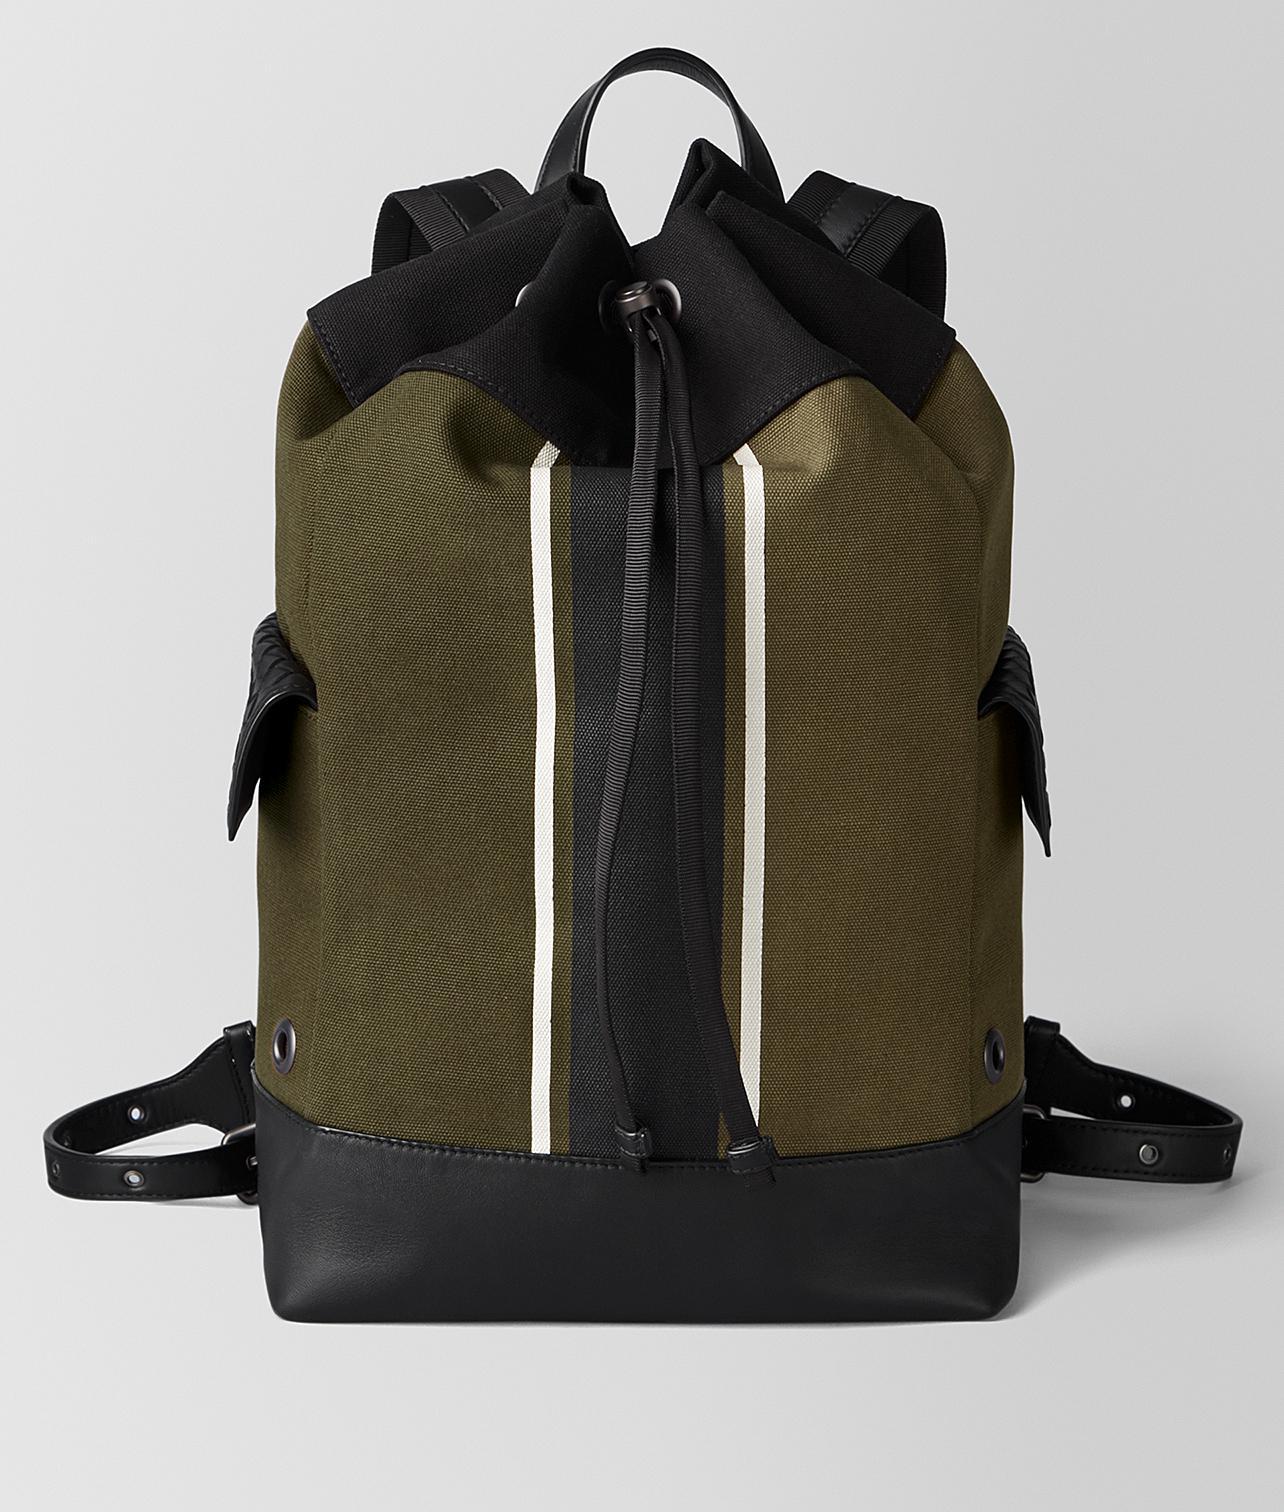 Bottega Veneta Mustard nero Canvas Backpack for Men - Lyst 8ffb7f1a1f